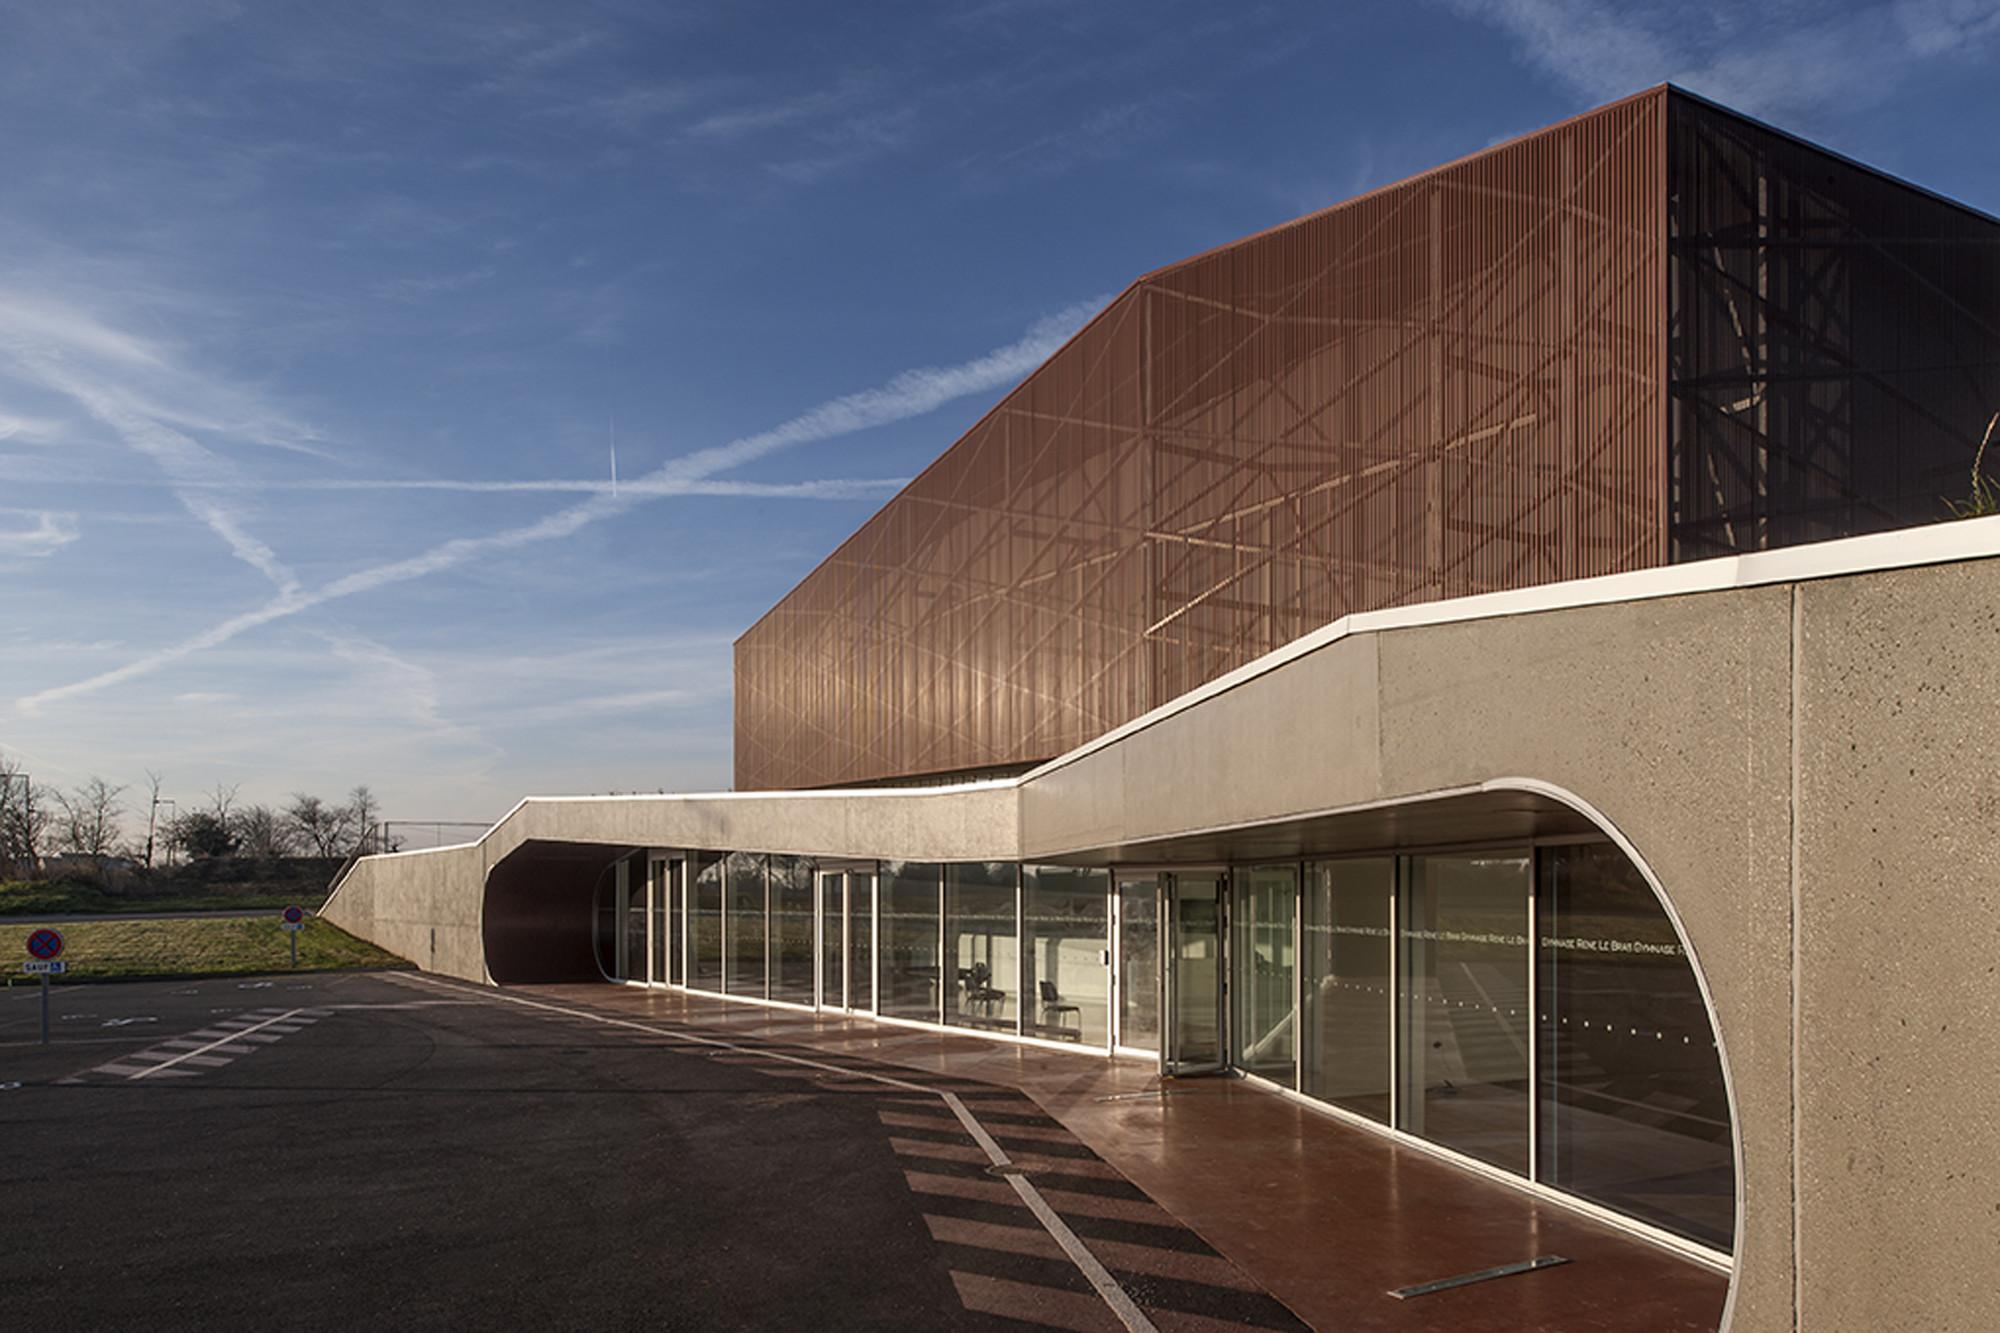 Galer a de gimnasio plabennec bohuon bertic architectes 19 for Gimnasio 19